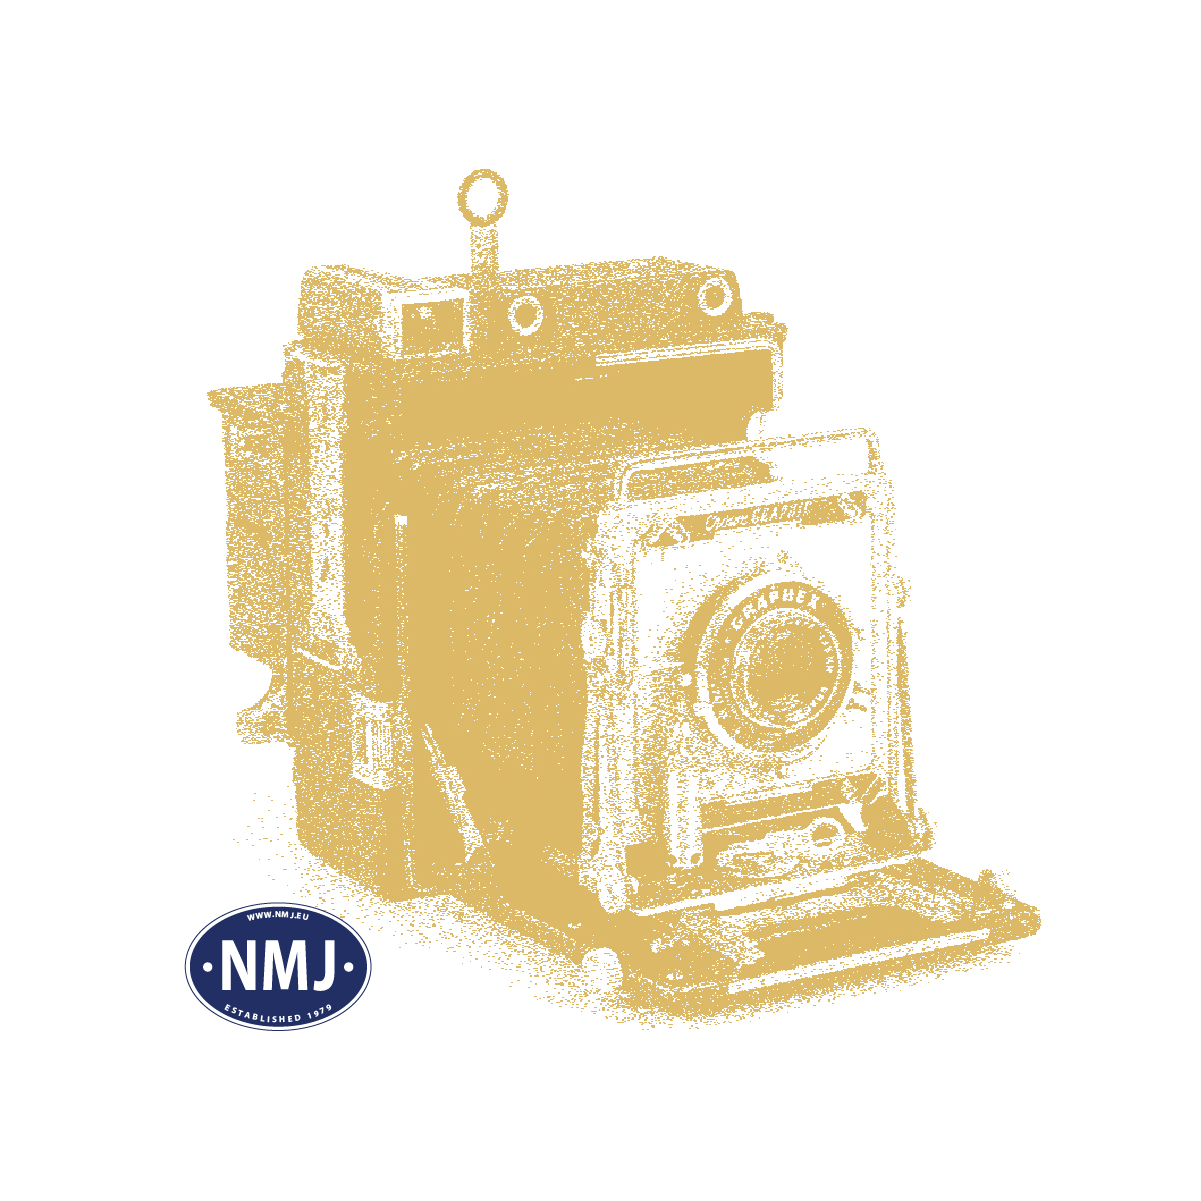 NMJT95102 - NMJ Topline DSB MY 1112, AC Digital